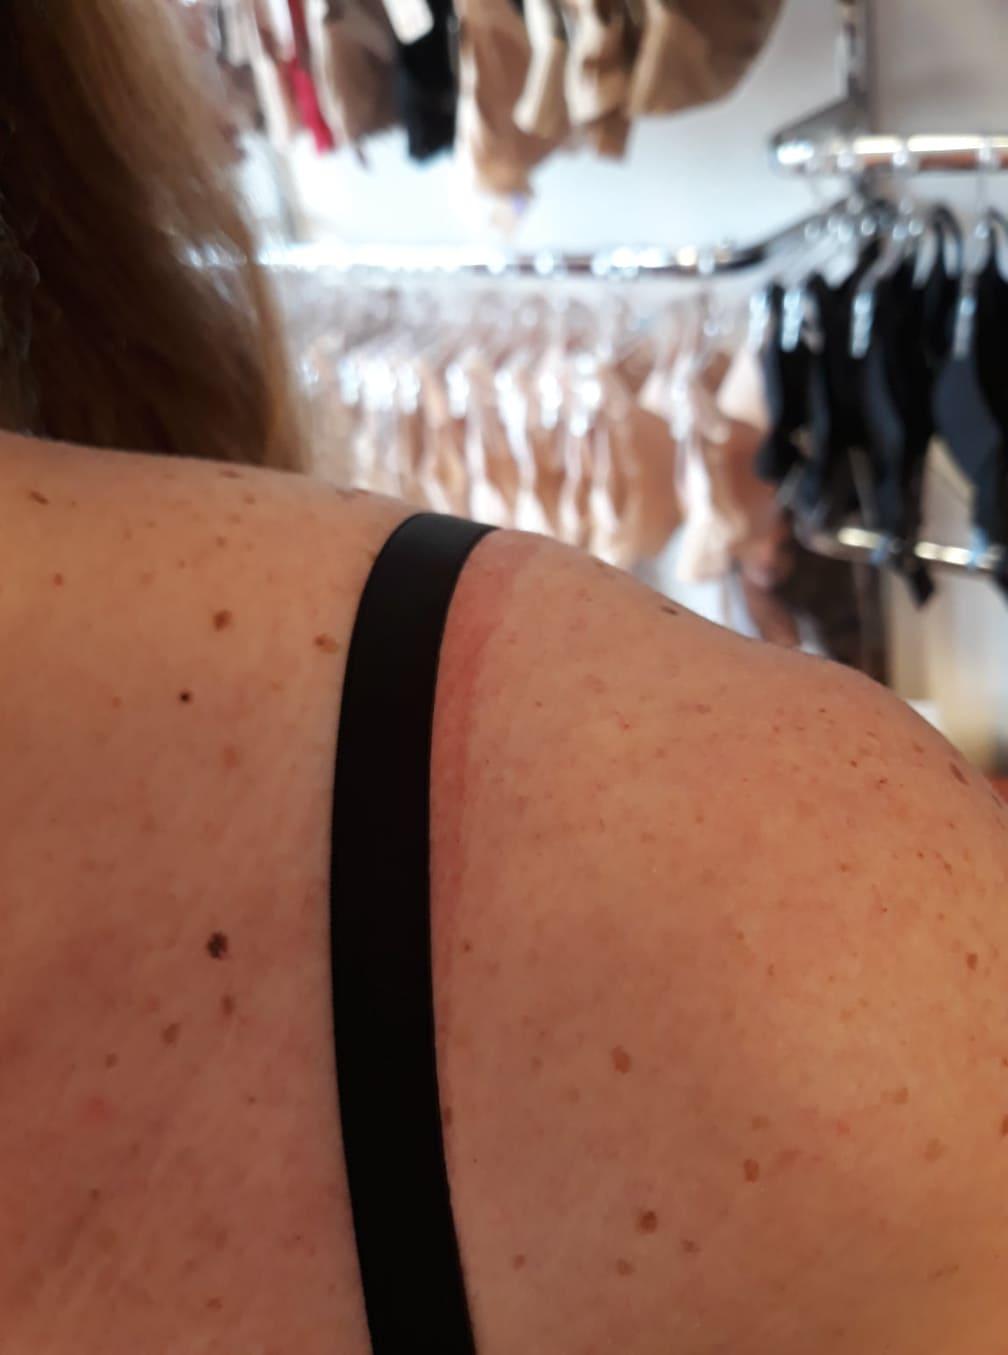 protlacena-ramena-od-podprsenky-podlozky-pod-raminka